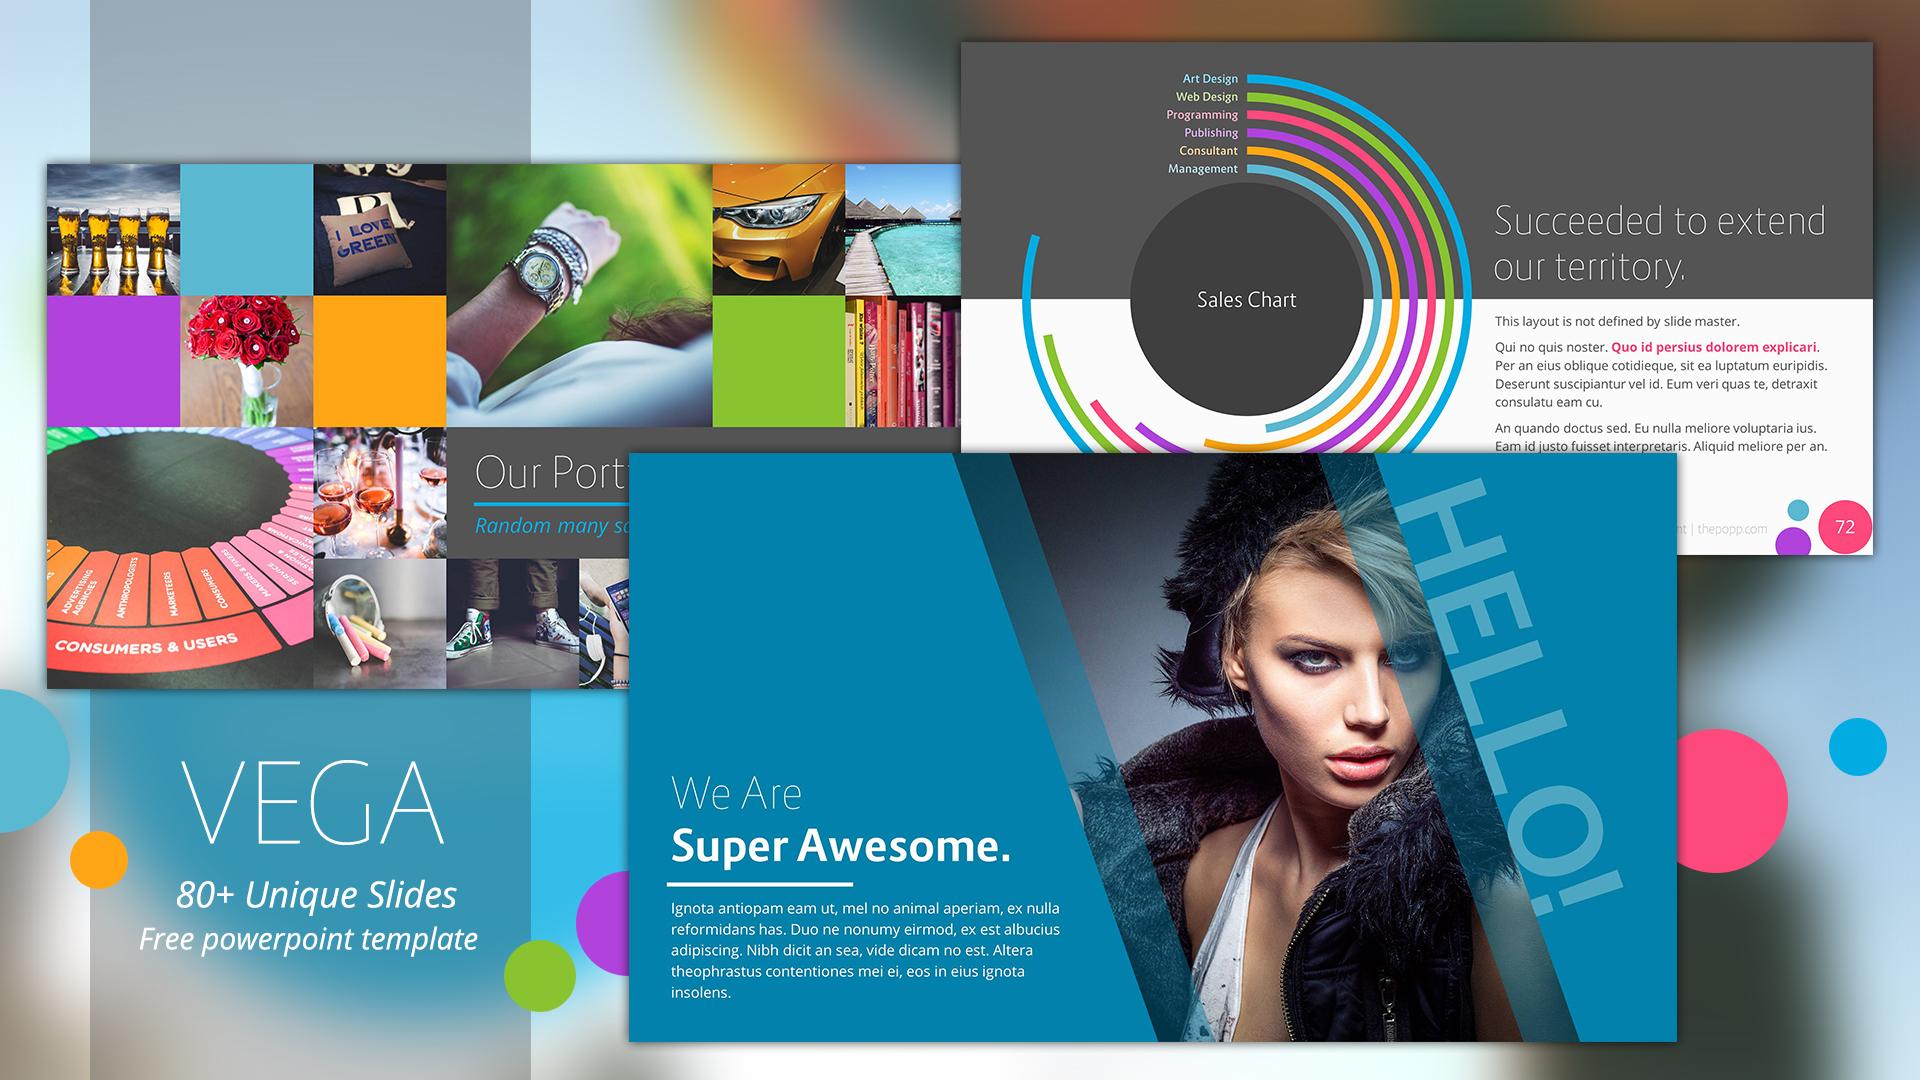 vega free powerpoint template フリーパワーポイントテンプレート